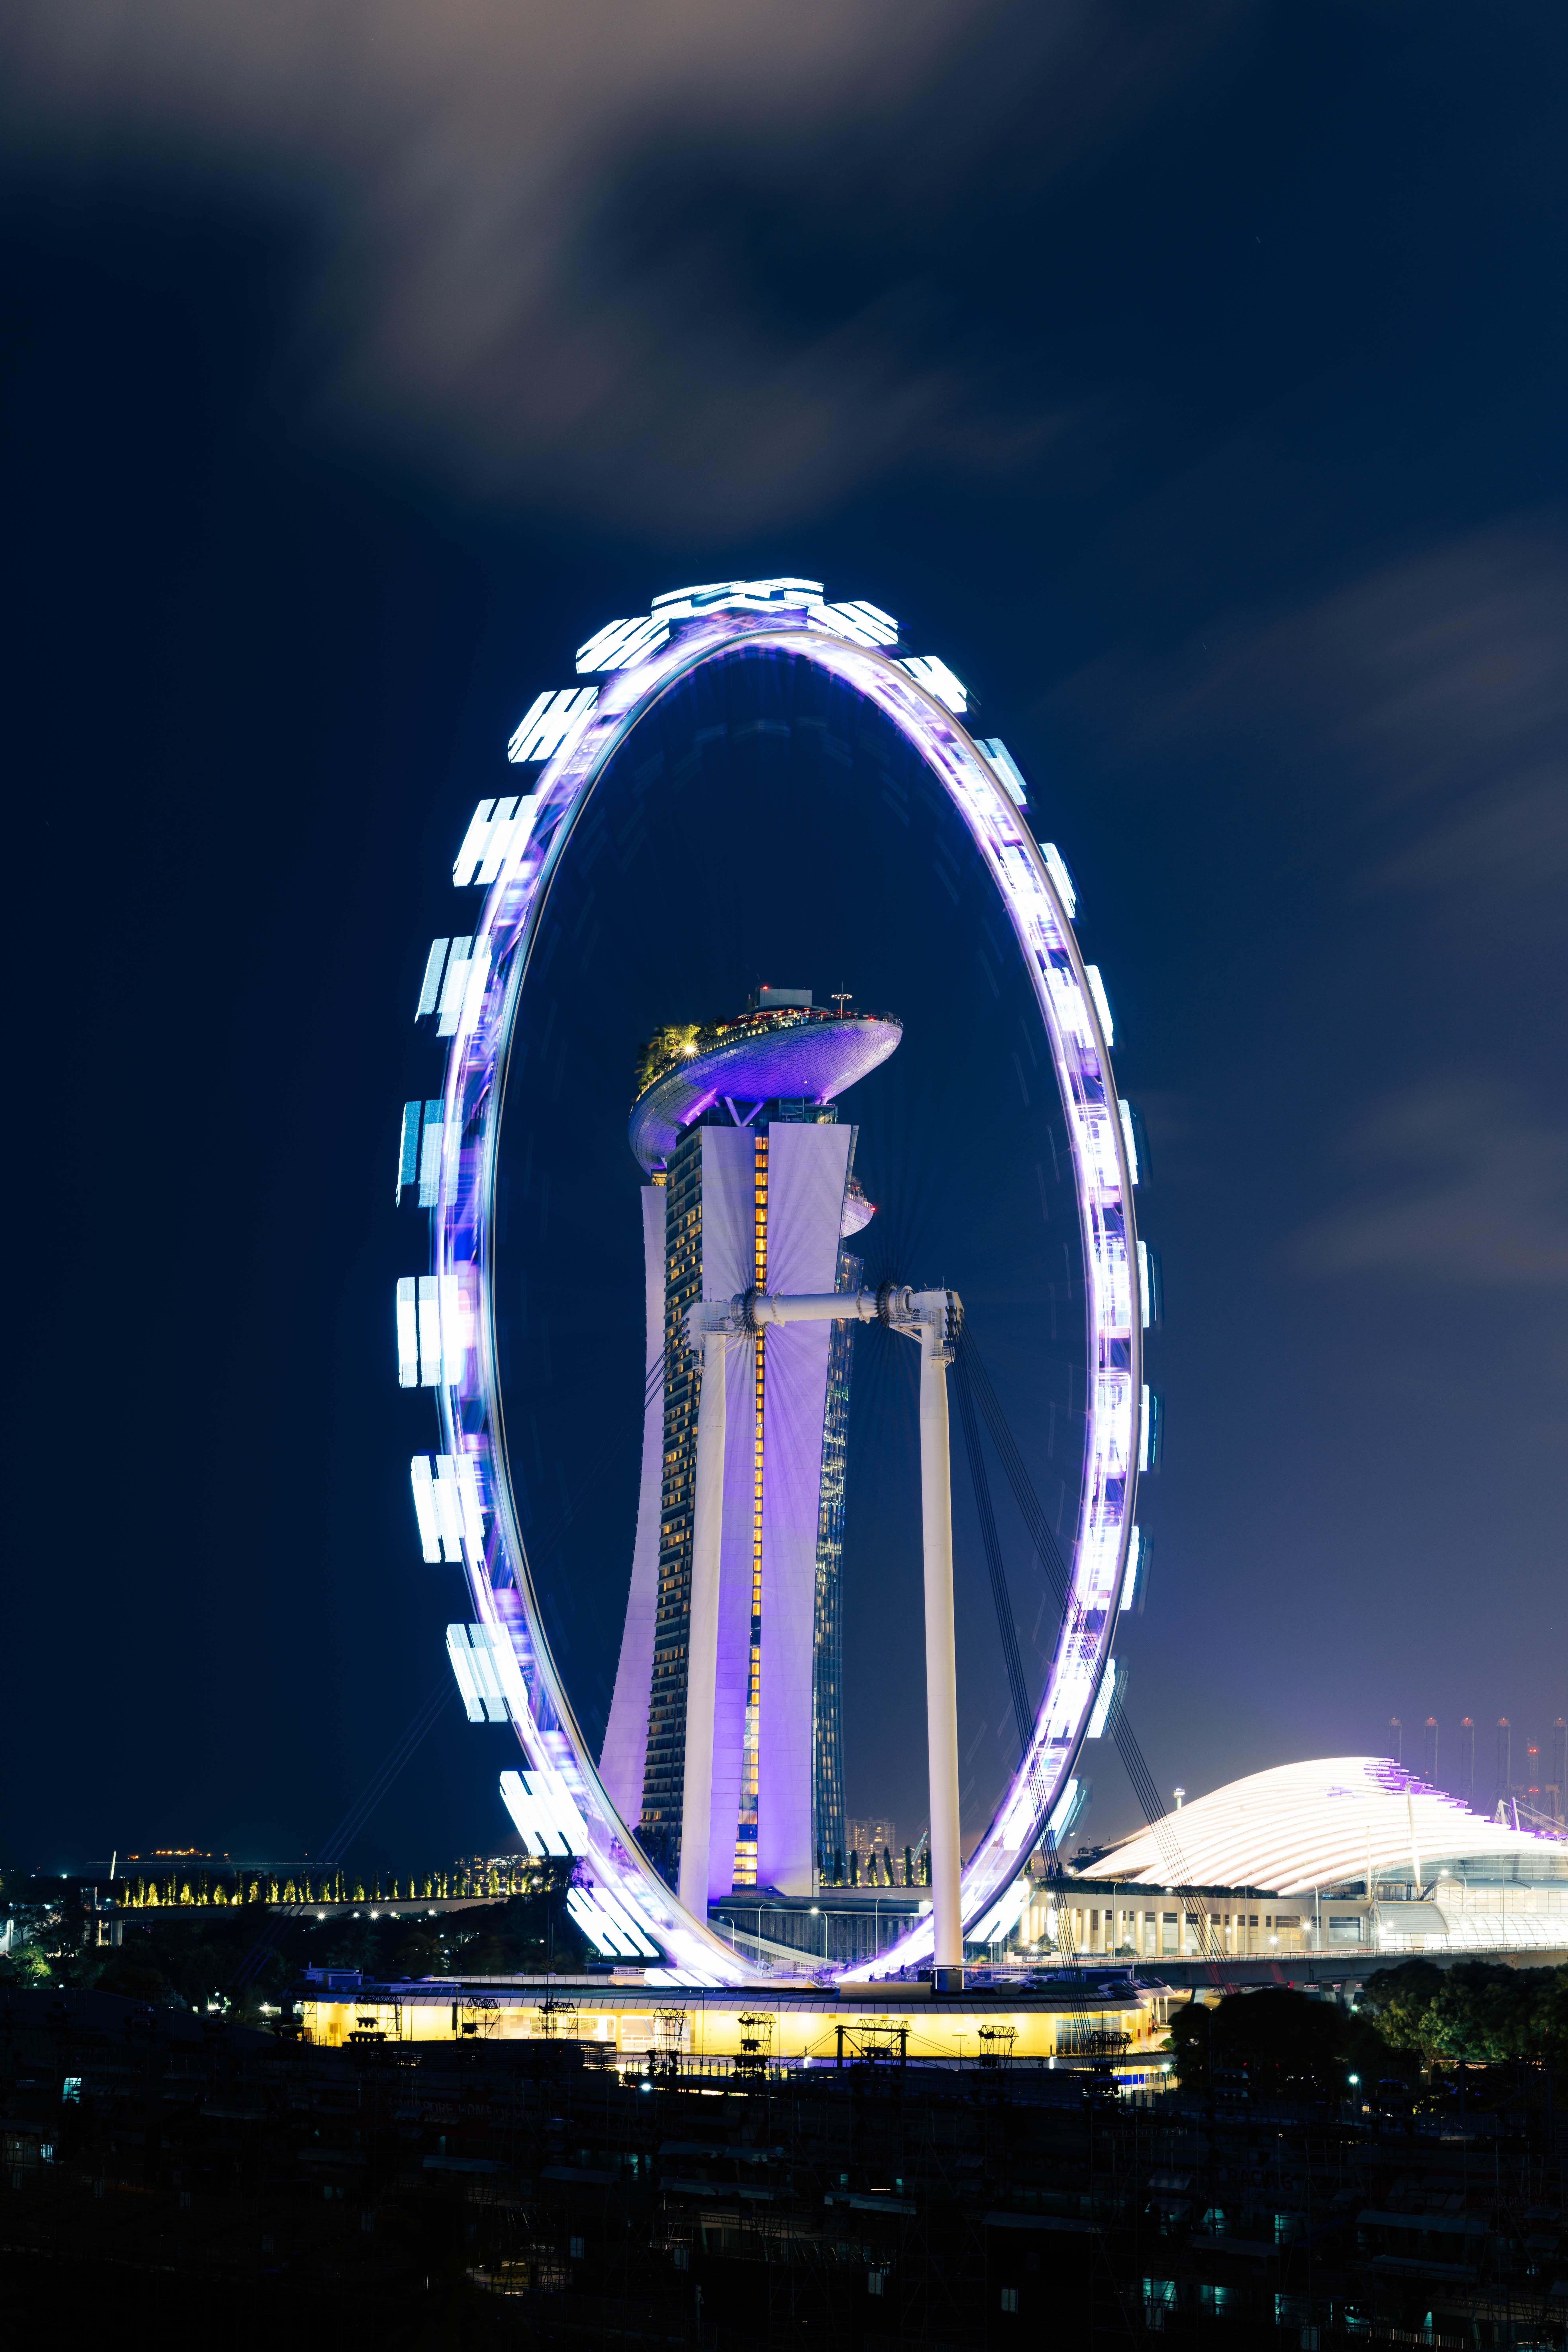 blue and white ferris wheel+